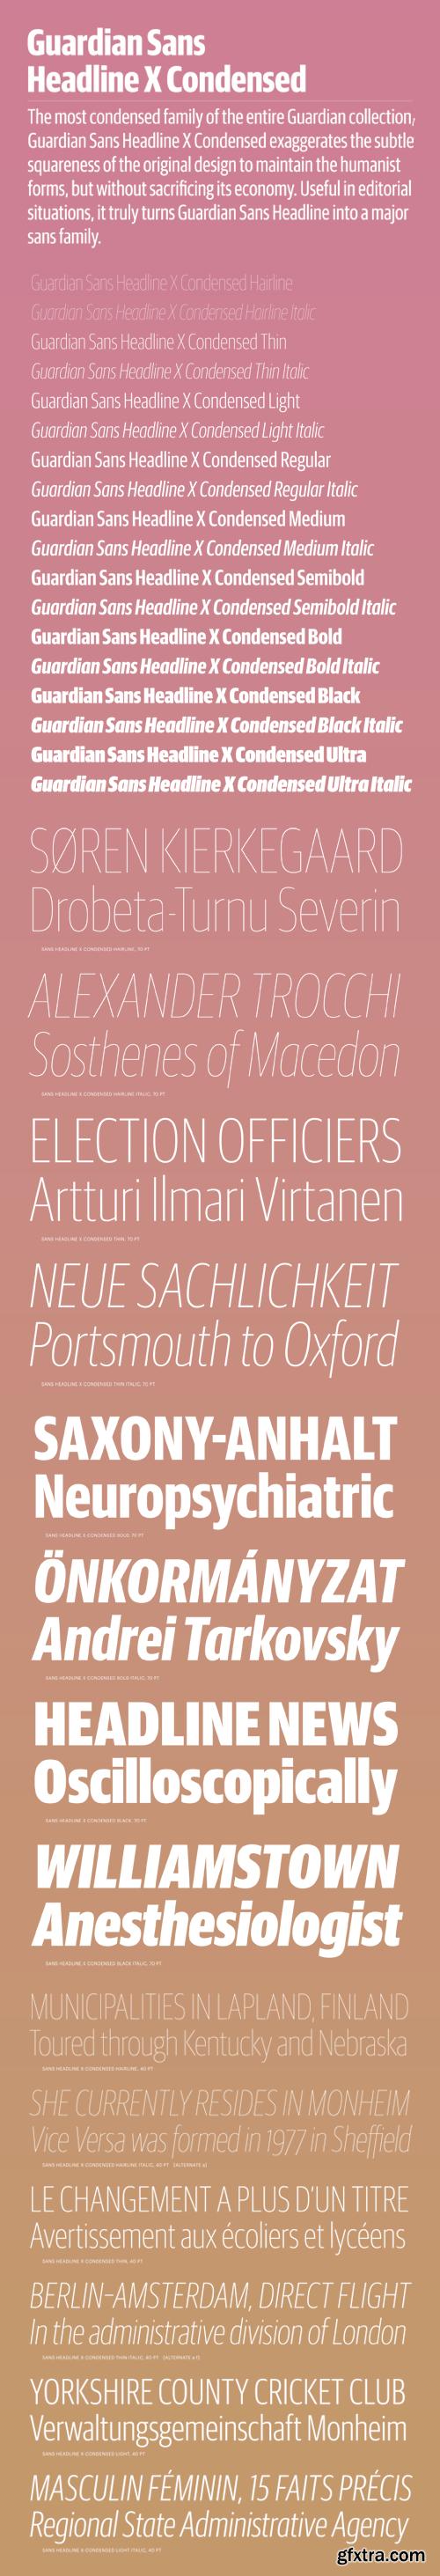 Guardian Sans Headline X Condensed Font Family